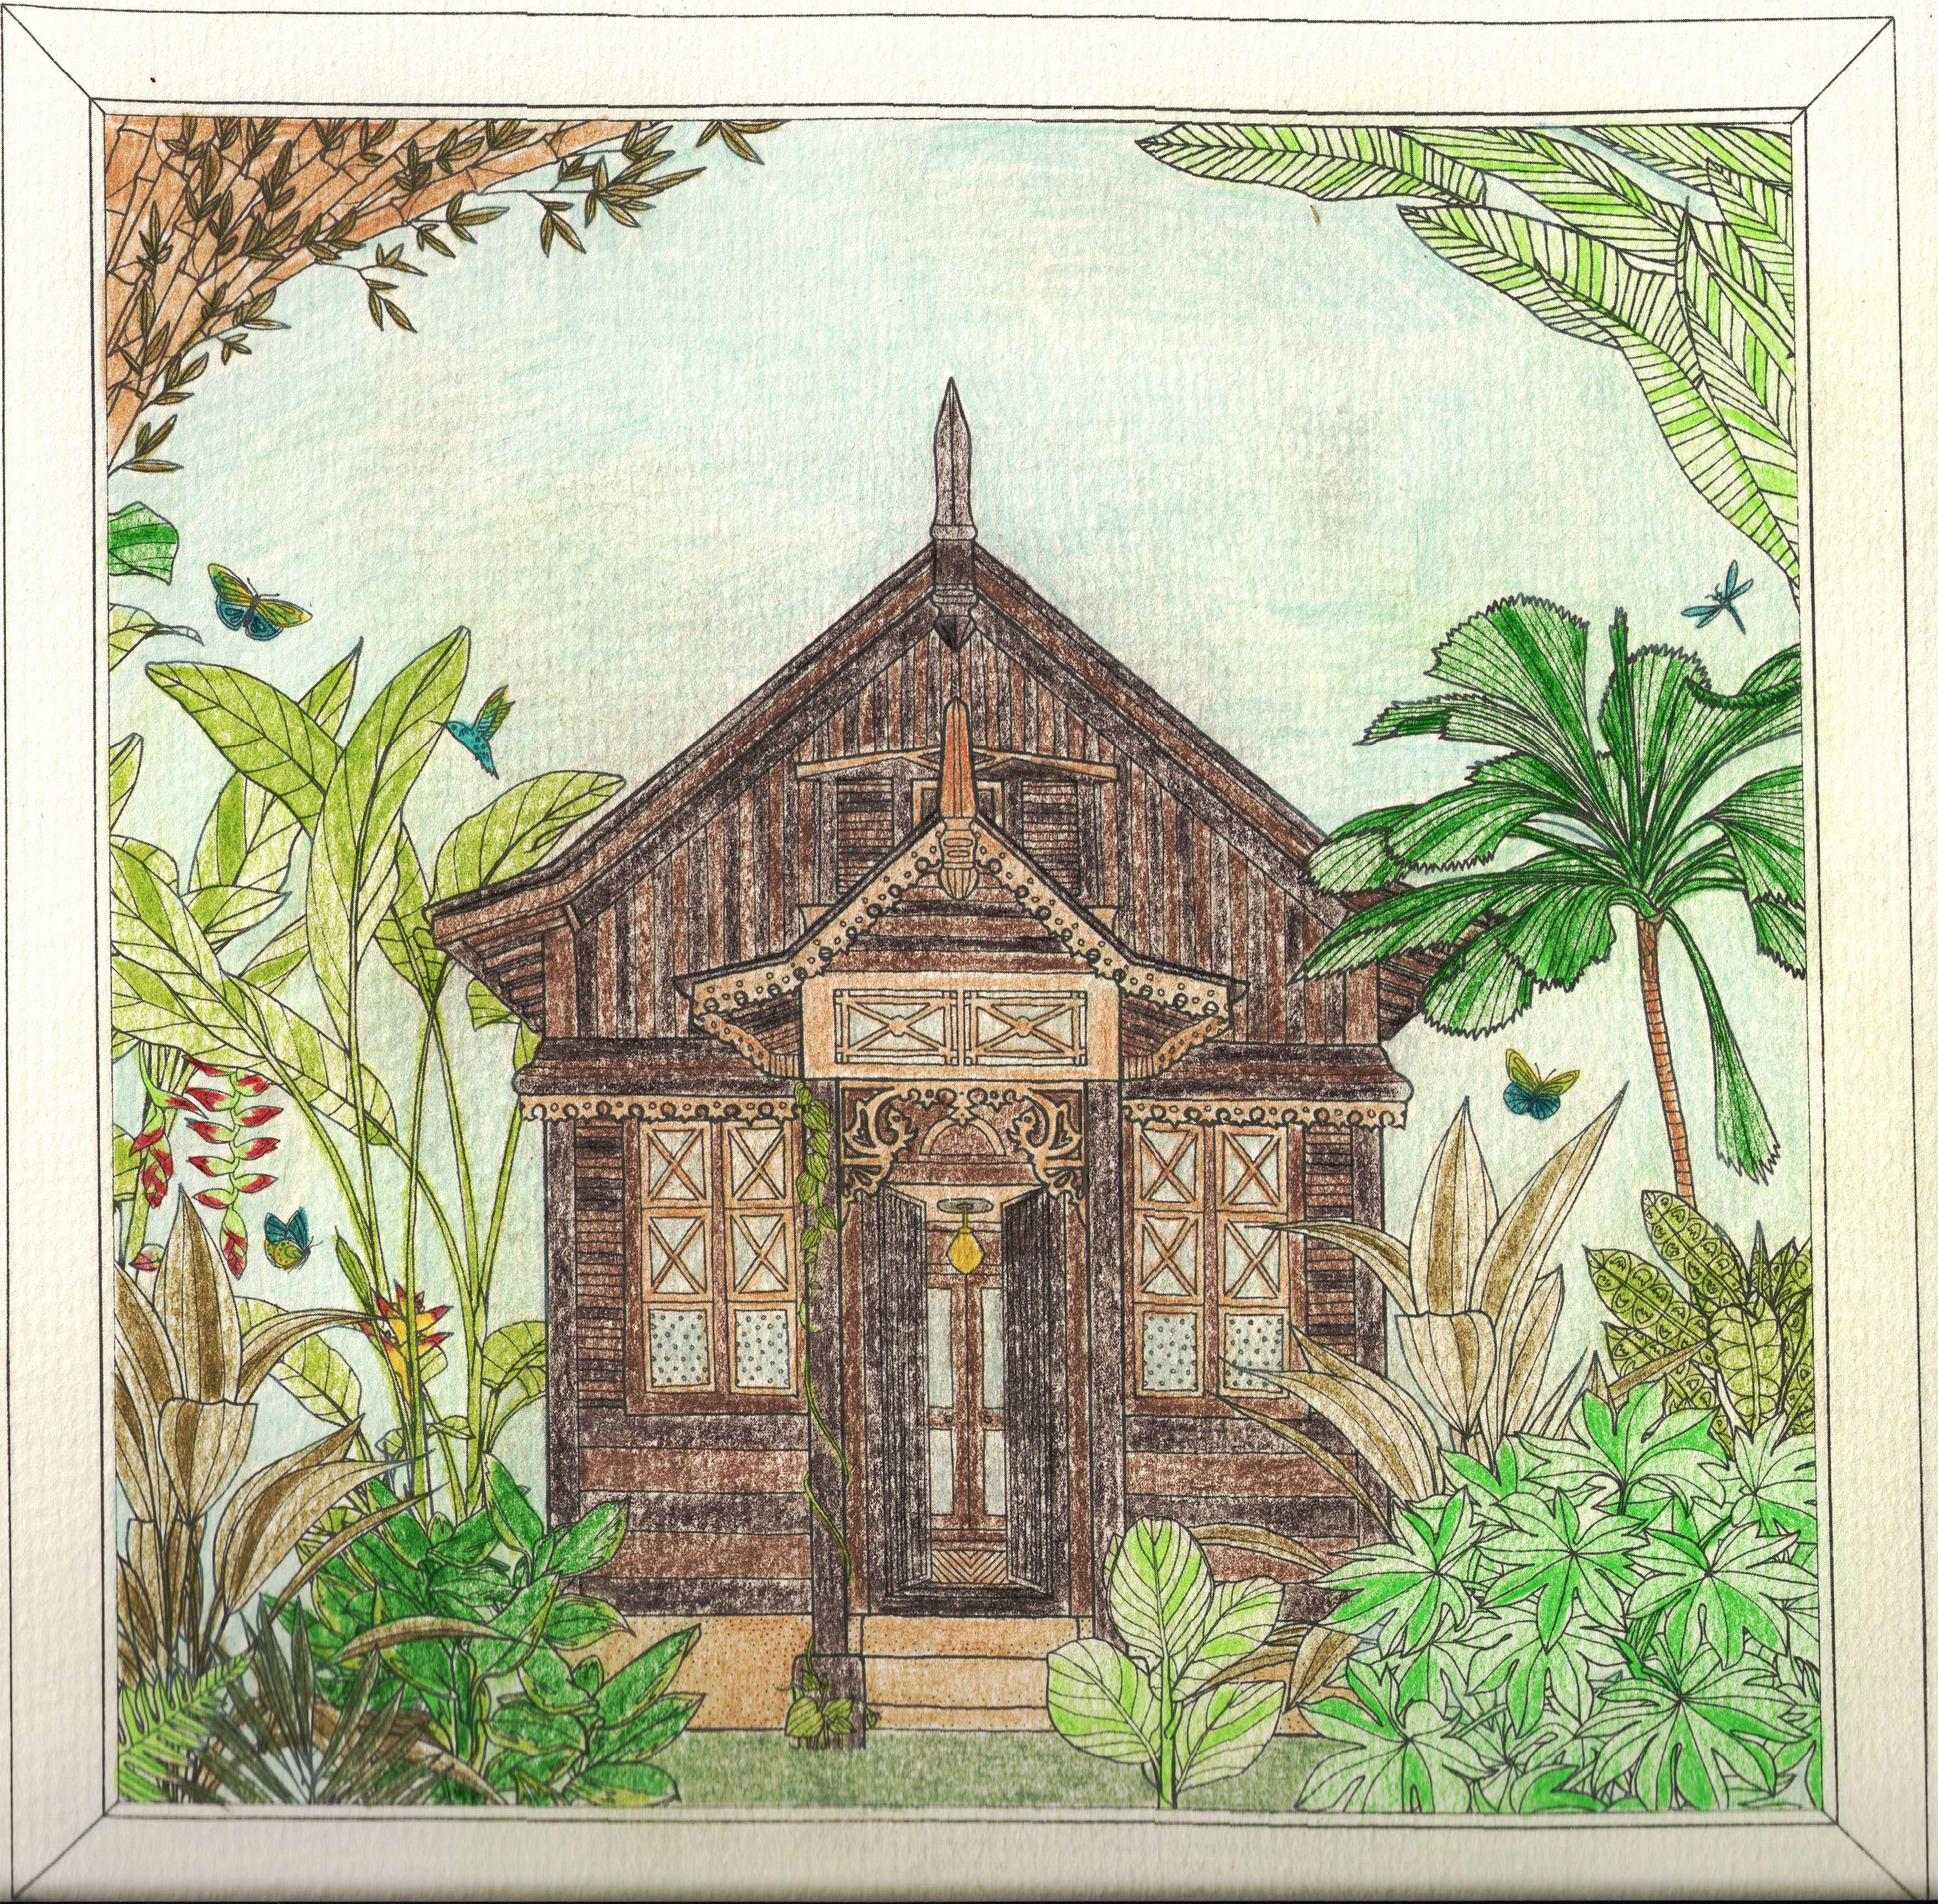 Jade Gedeon Rainforest Escape Coloring Book Line Artwork Coloring Books Painting